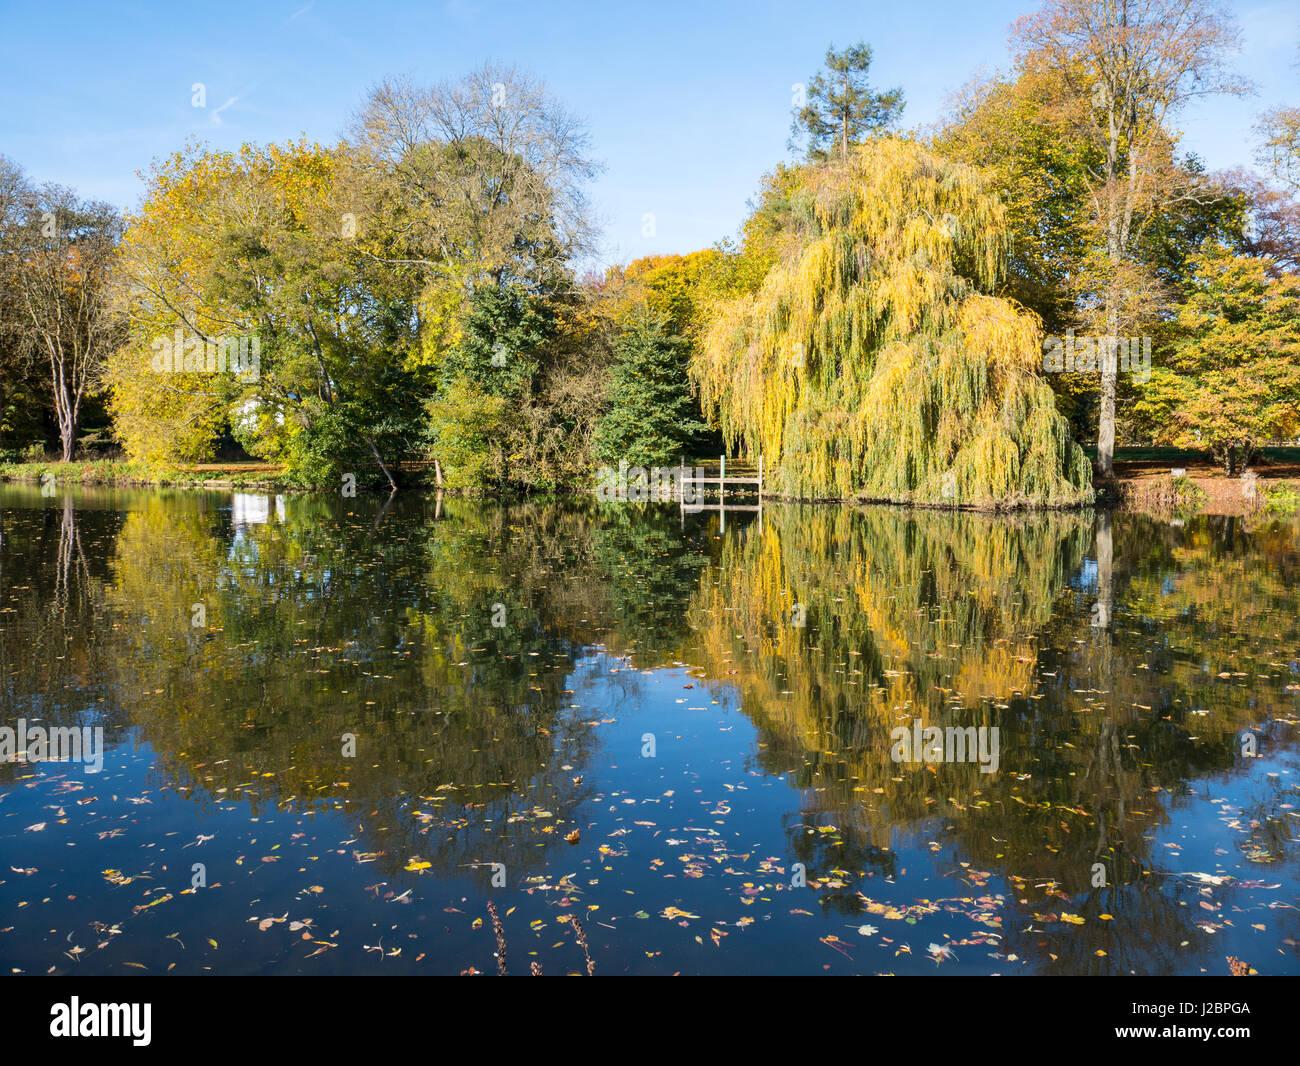 Riverside Tree Reflections, Pangbourne-on Thames, Reading, Berkshire, England, UK, GB. Stock Photo